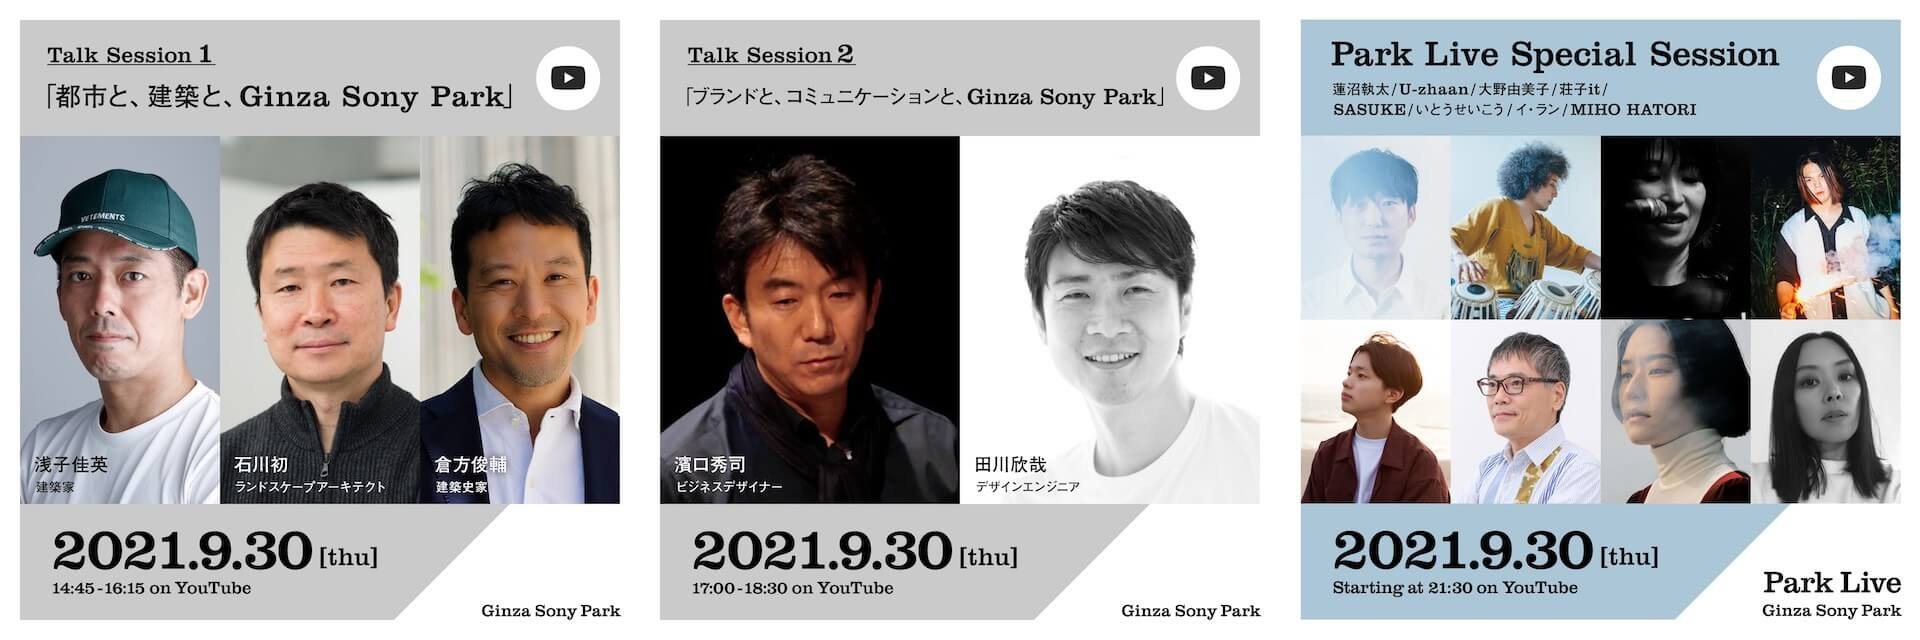 Ginza Sony Parkが一時閉園で蓮沼執太、U-zhaanらが出演したオンラインイベントのアーカイブ視聴が配信! music211004_ginza-sony-park-02